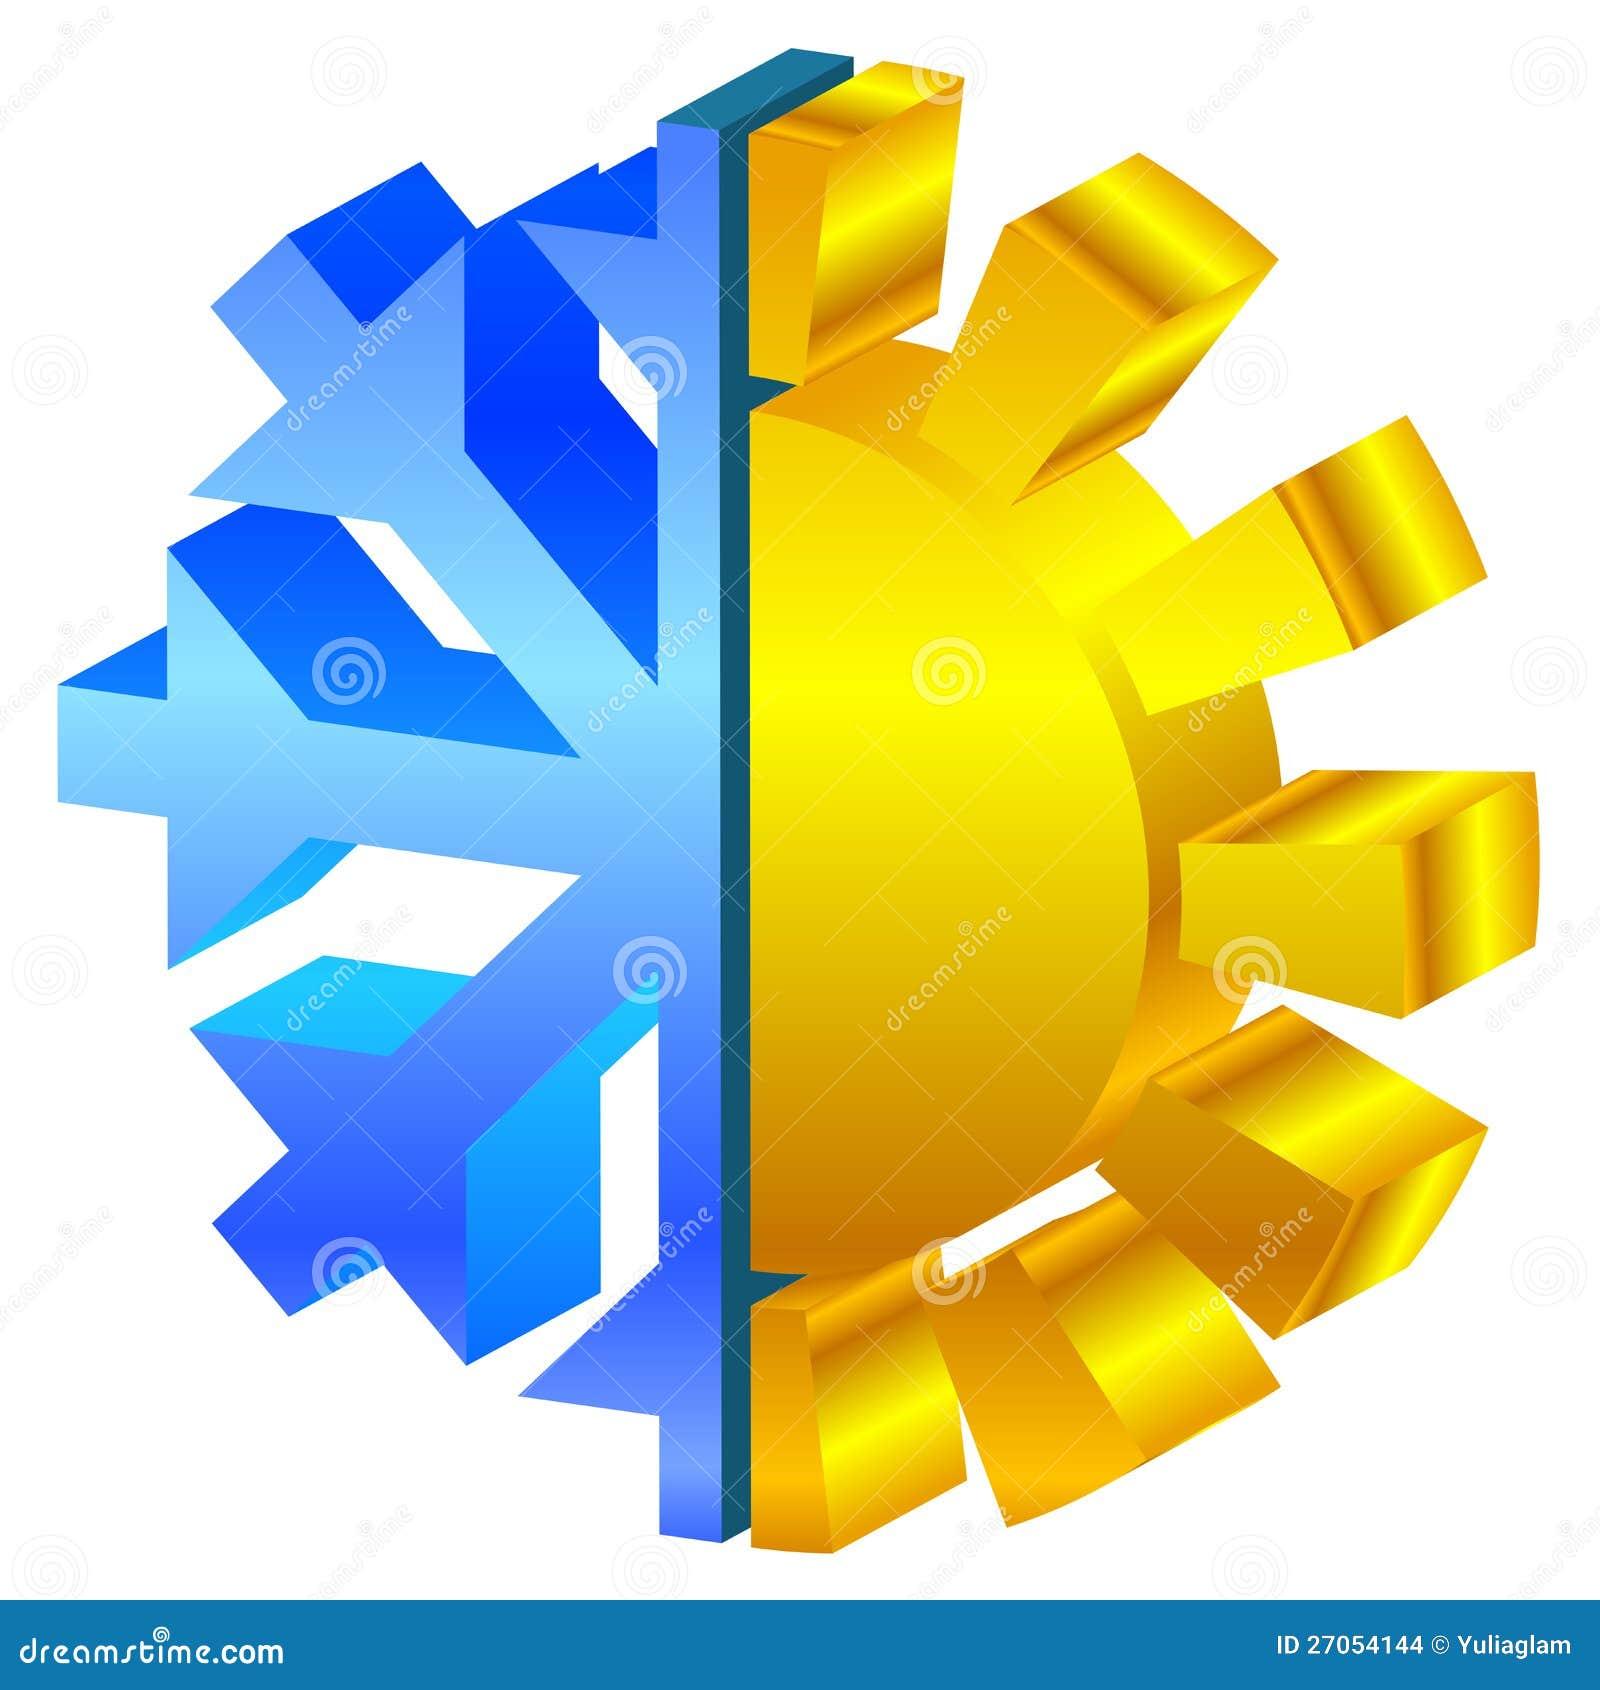 Sun amp snowflake icon stock images image 27054144